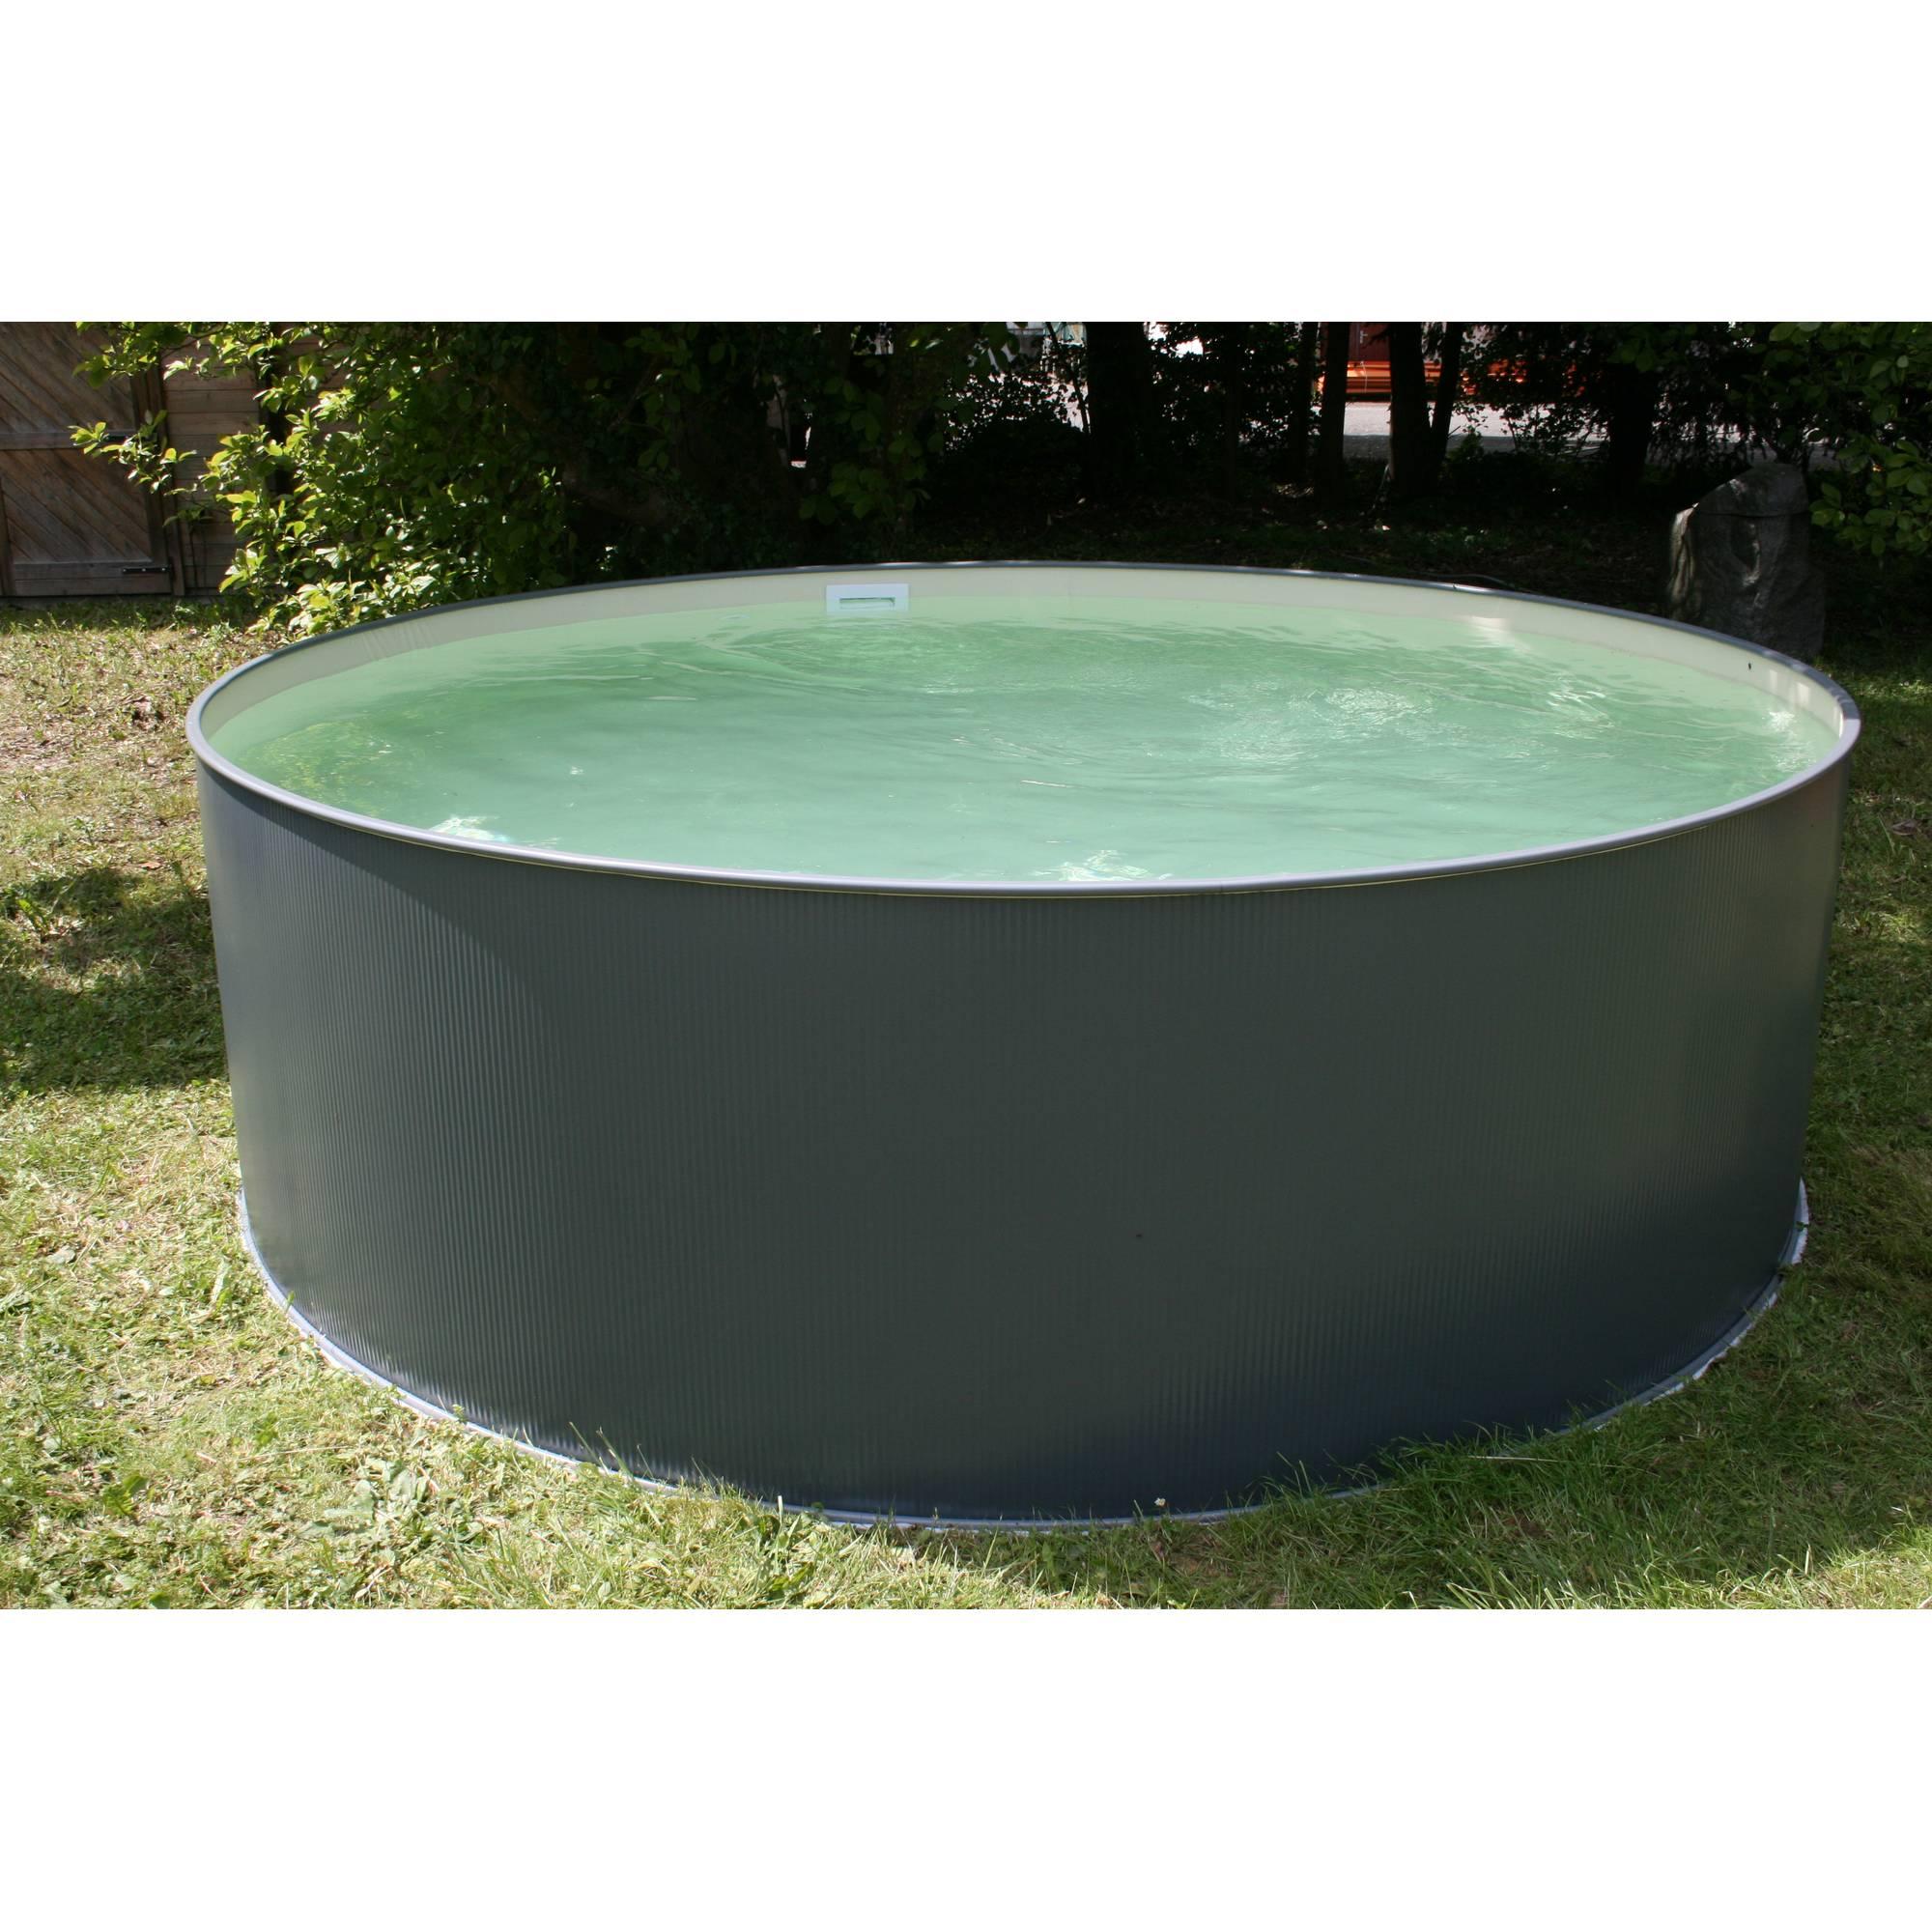 Stahlwandpool rundform anthrazit 350x90 cm, overlap S0